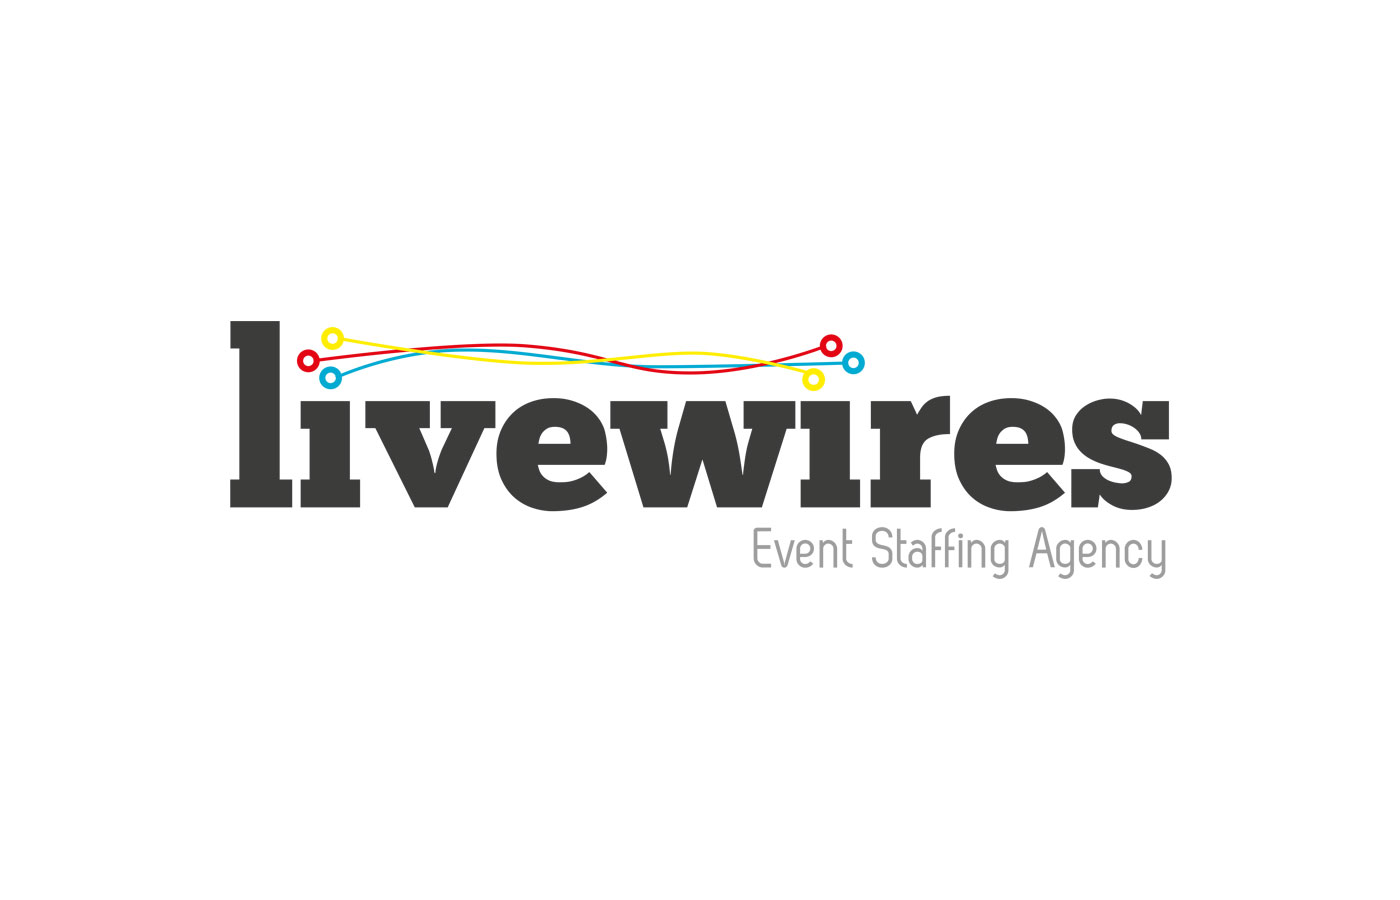 Logos-Livewires.jpg